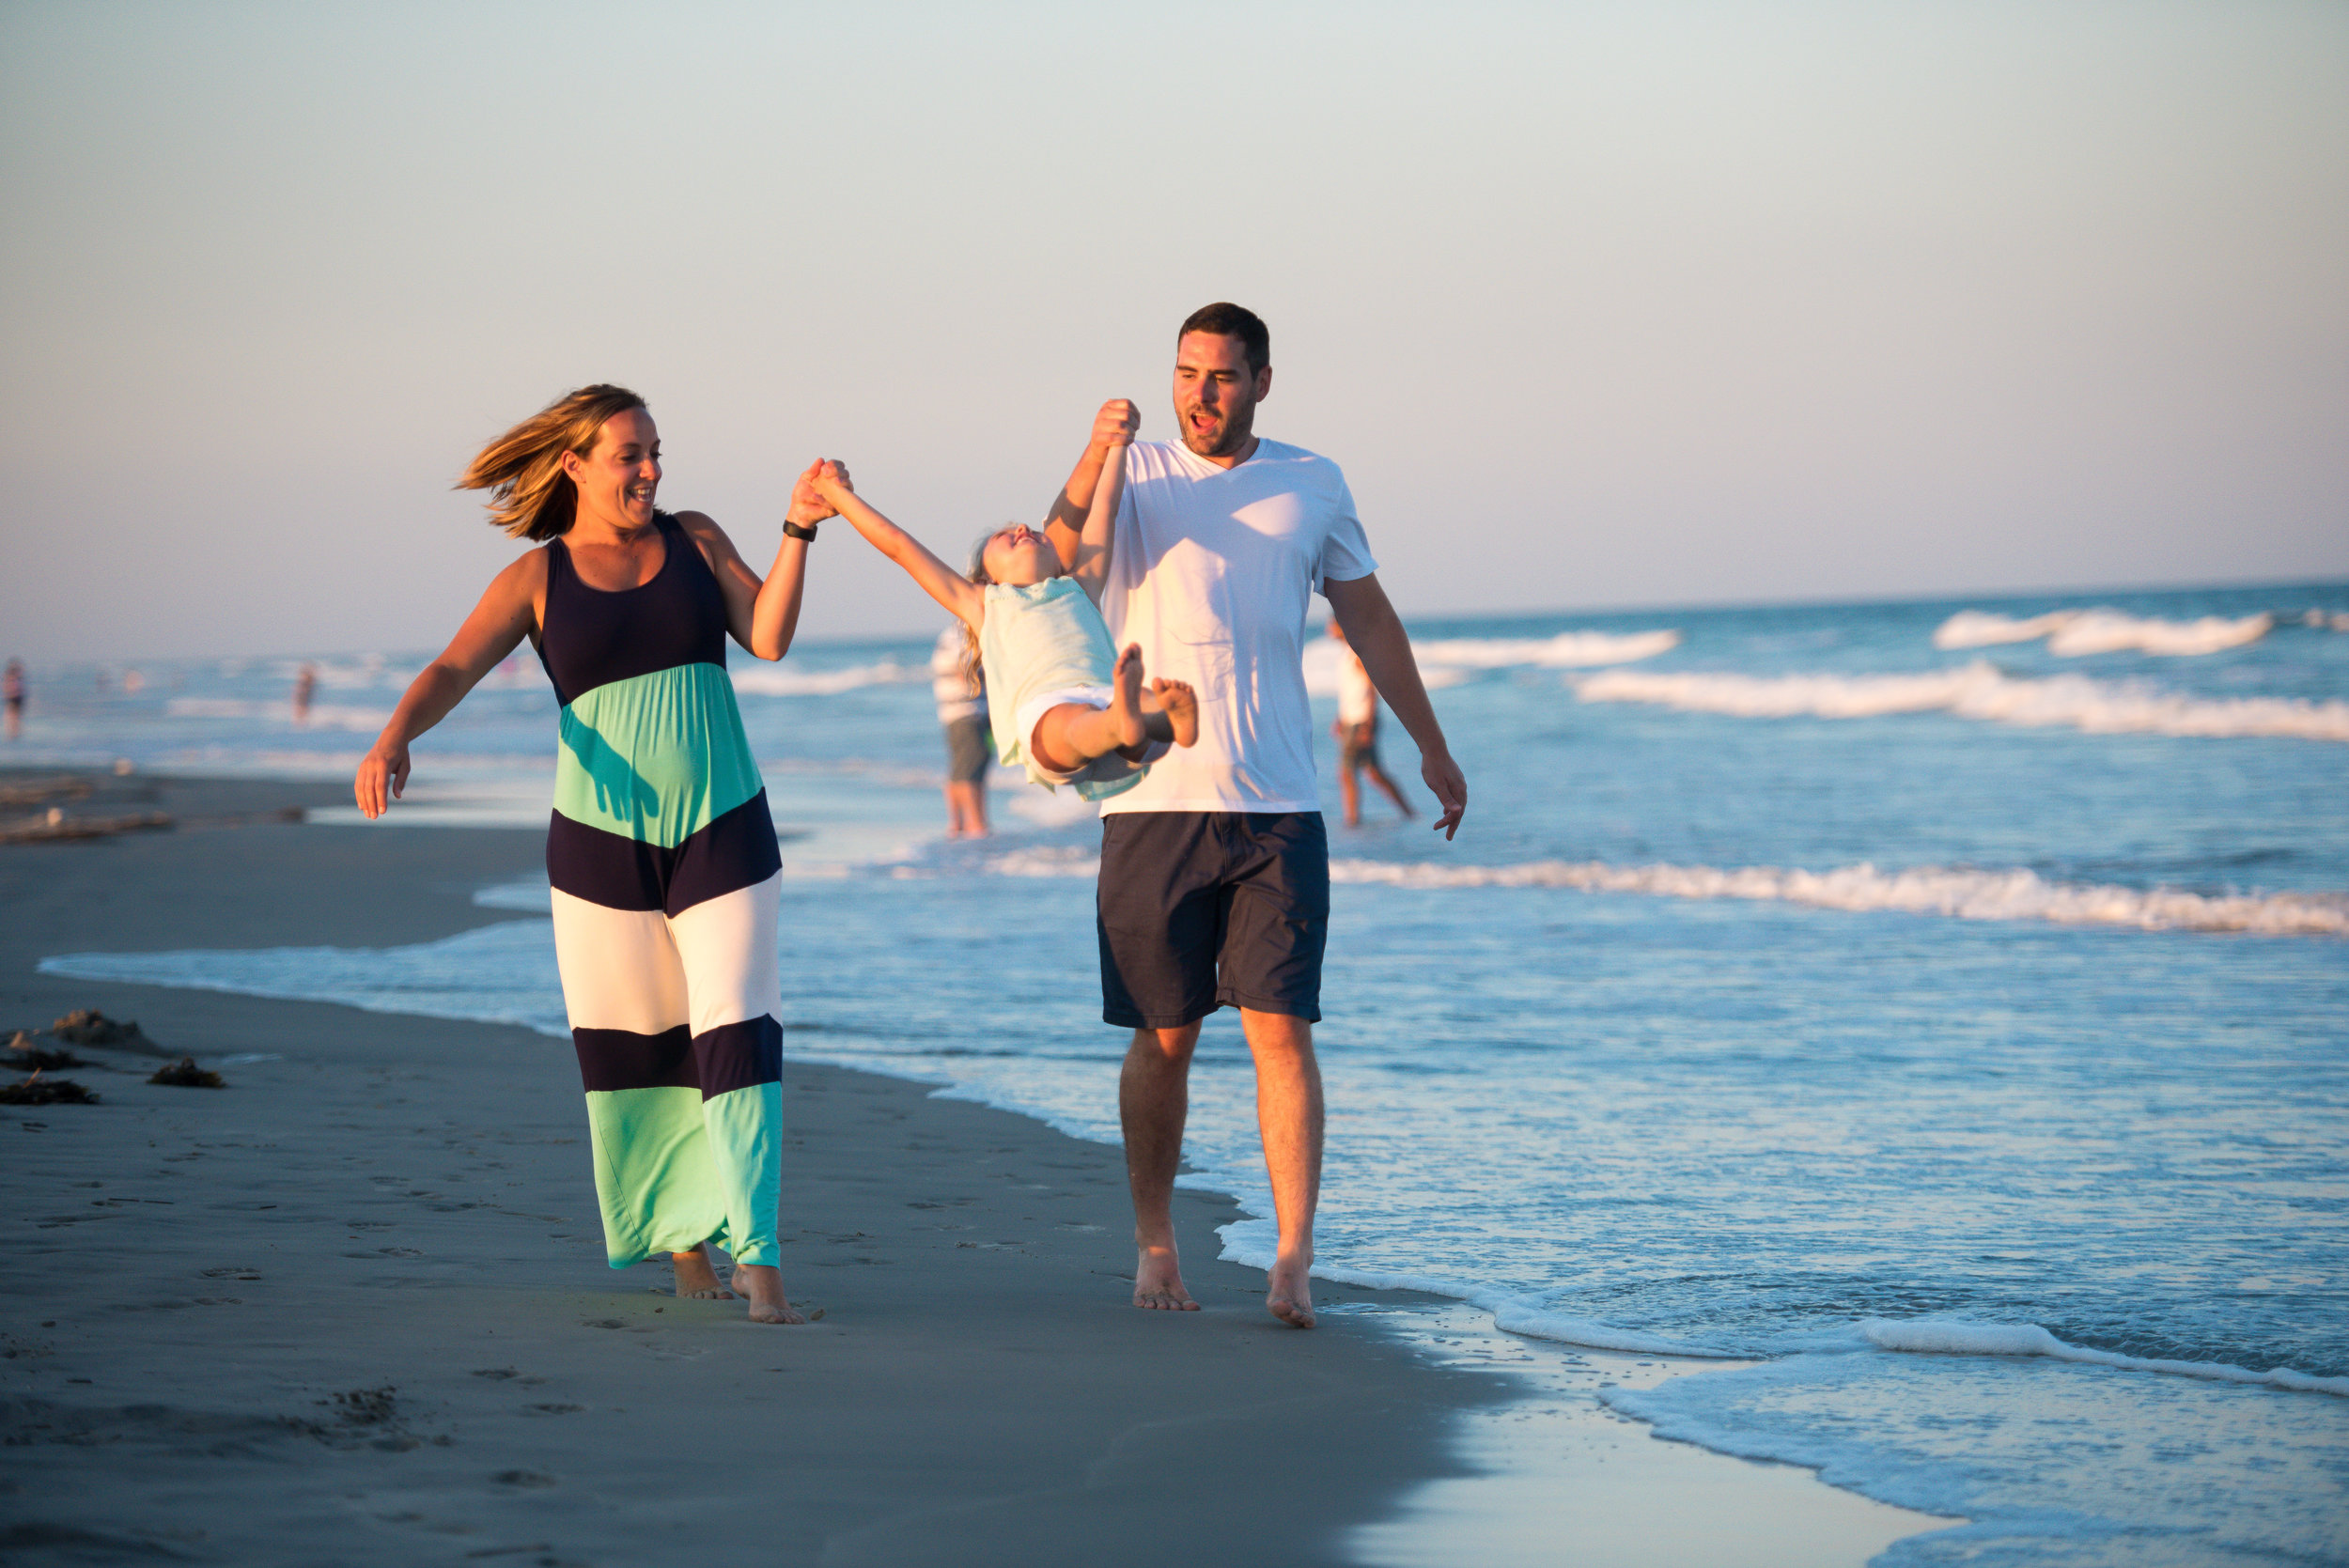 mccann_family_beach-042.jpg